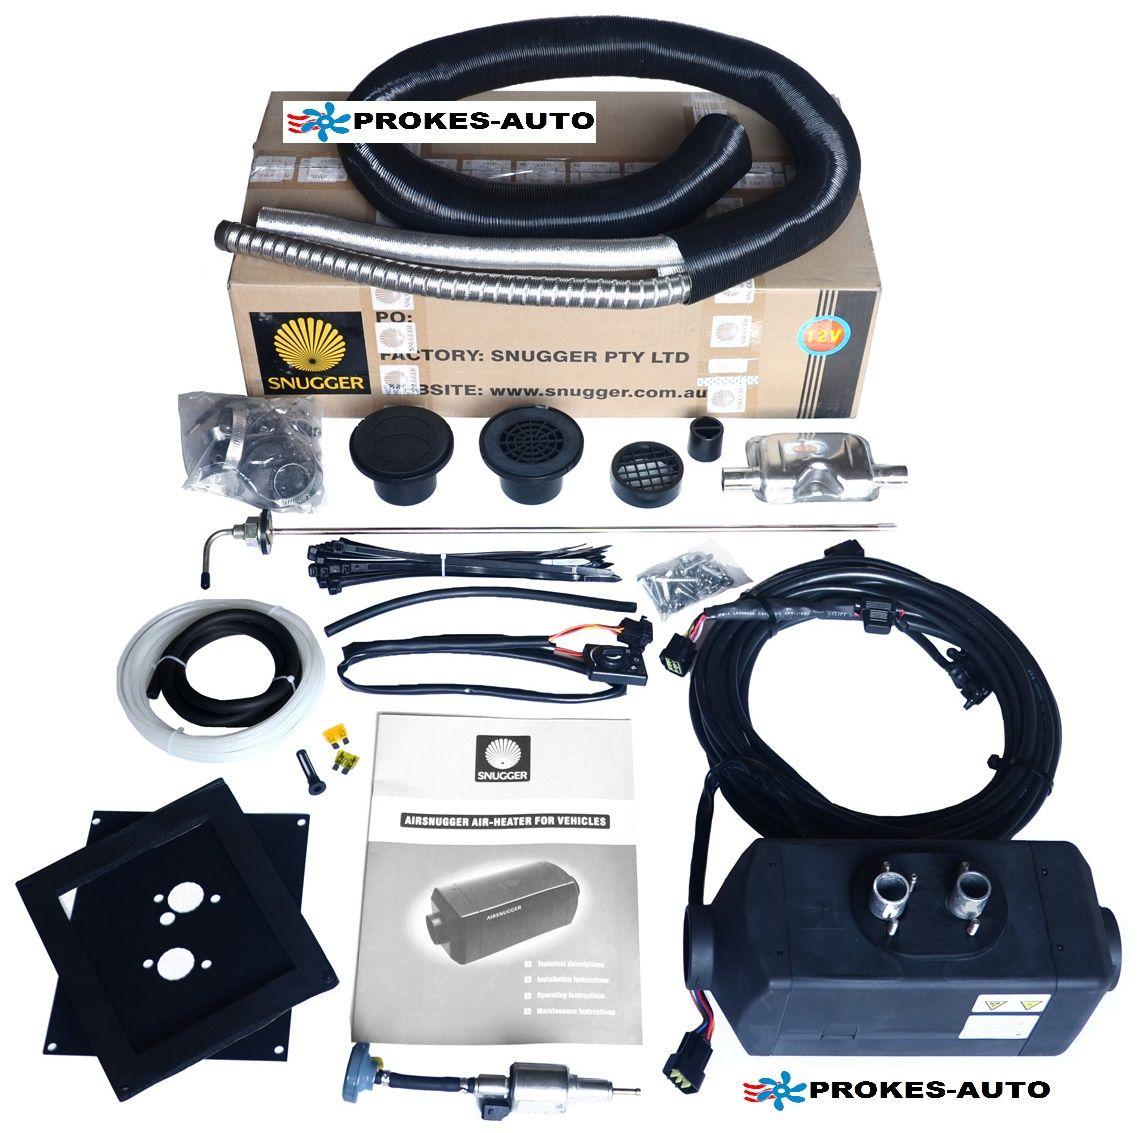 SNUGGER Luft Heizung Diesel 4,2kW PLUS 12V